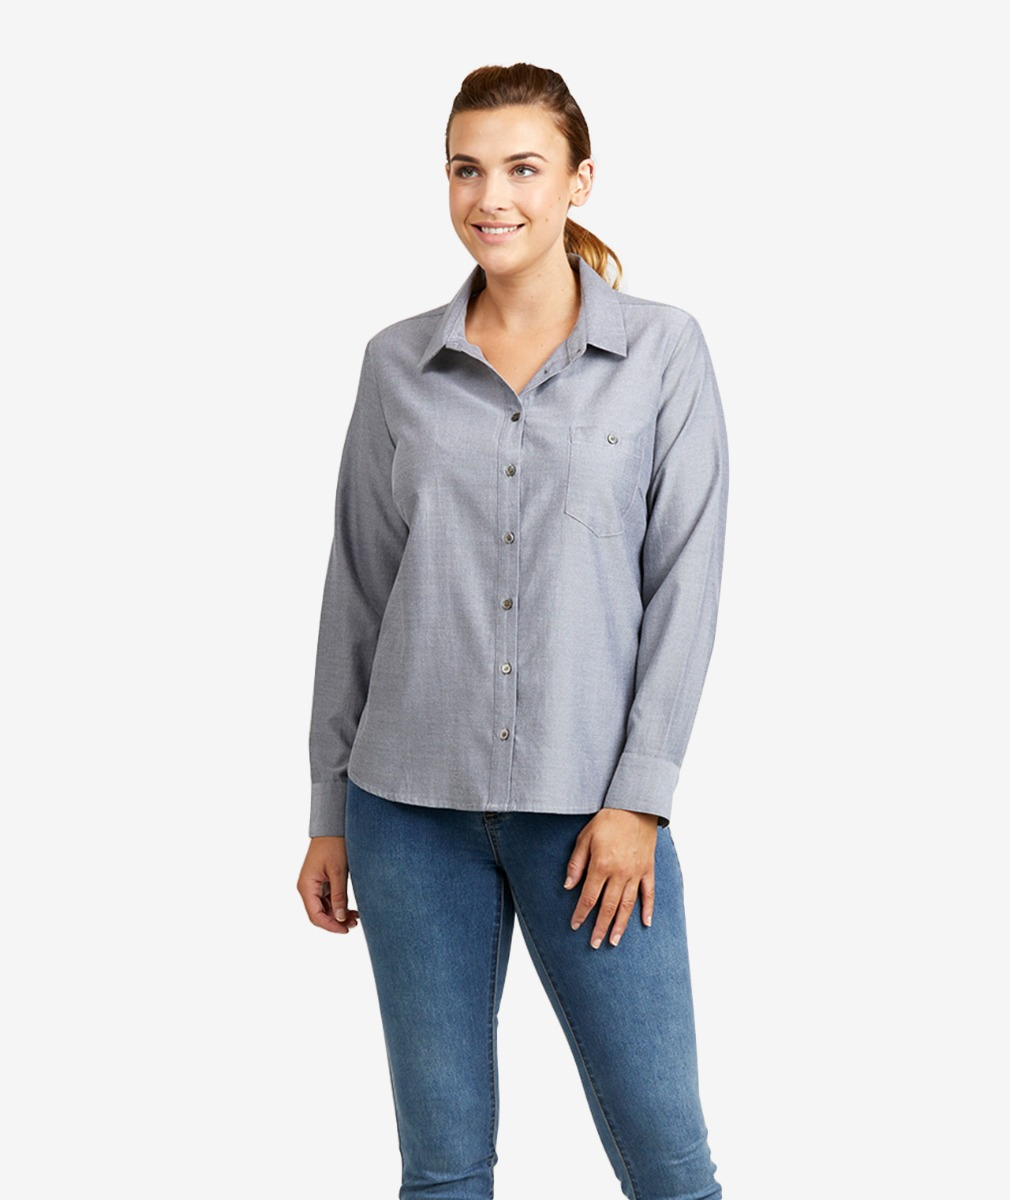 Swanndri Women's Windsor 100% Cotton Long Sleeve Shirt